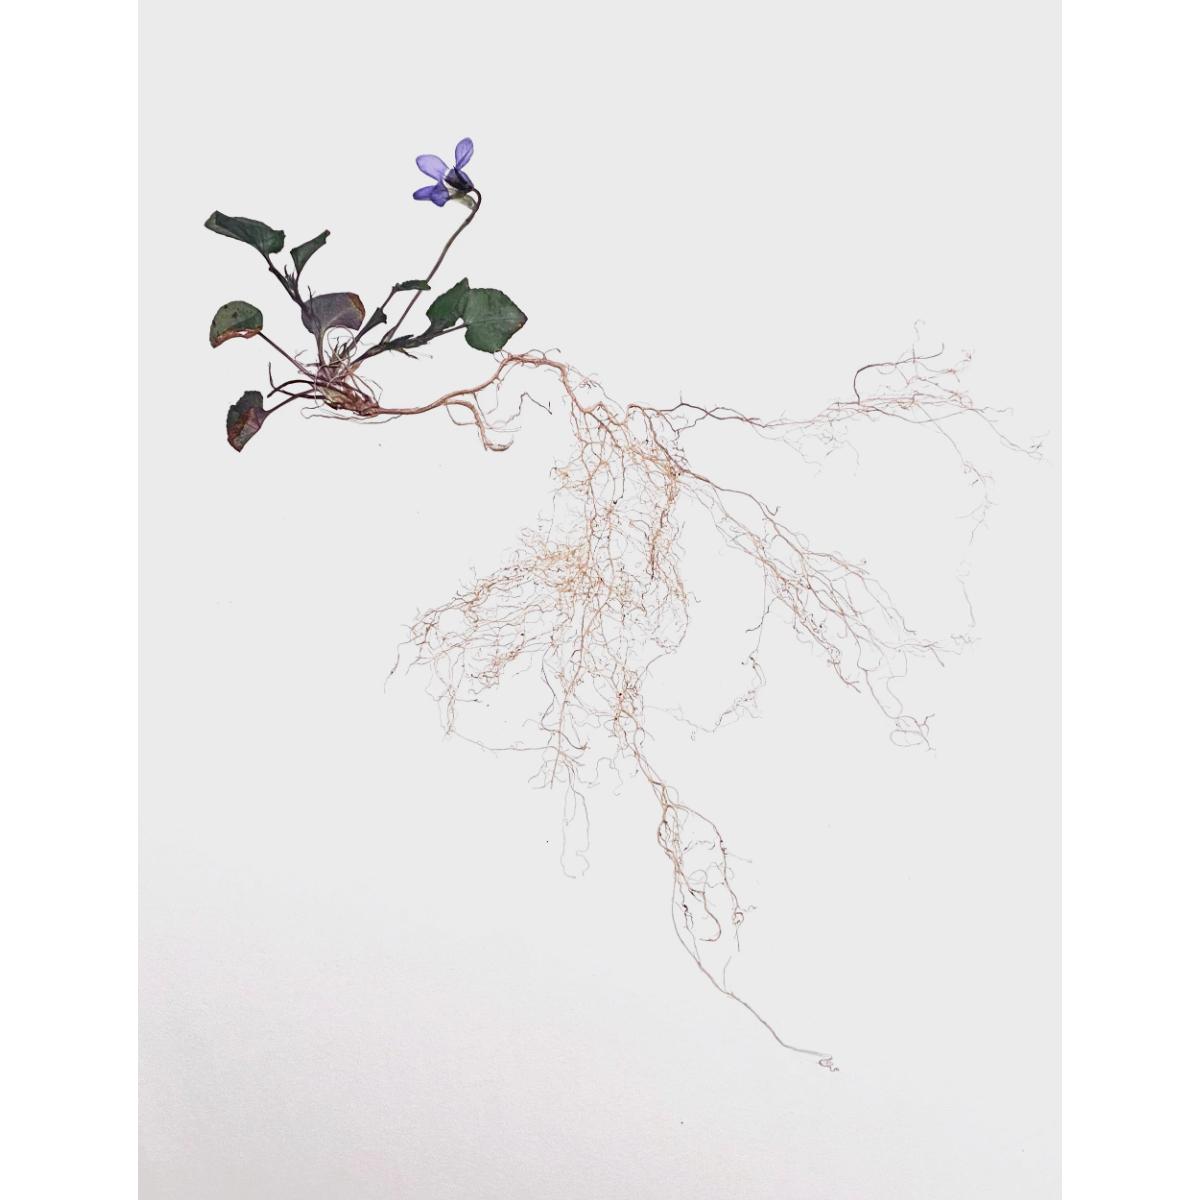 Sabrina Hoelzer Underneath. Early dog-violet. Unframed plate 29,6 x 42,1 cm